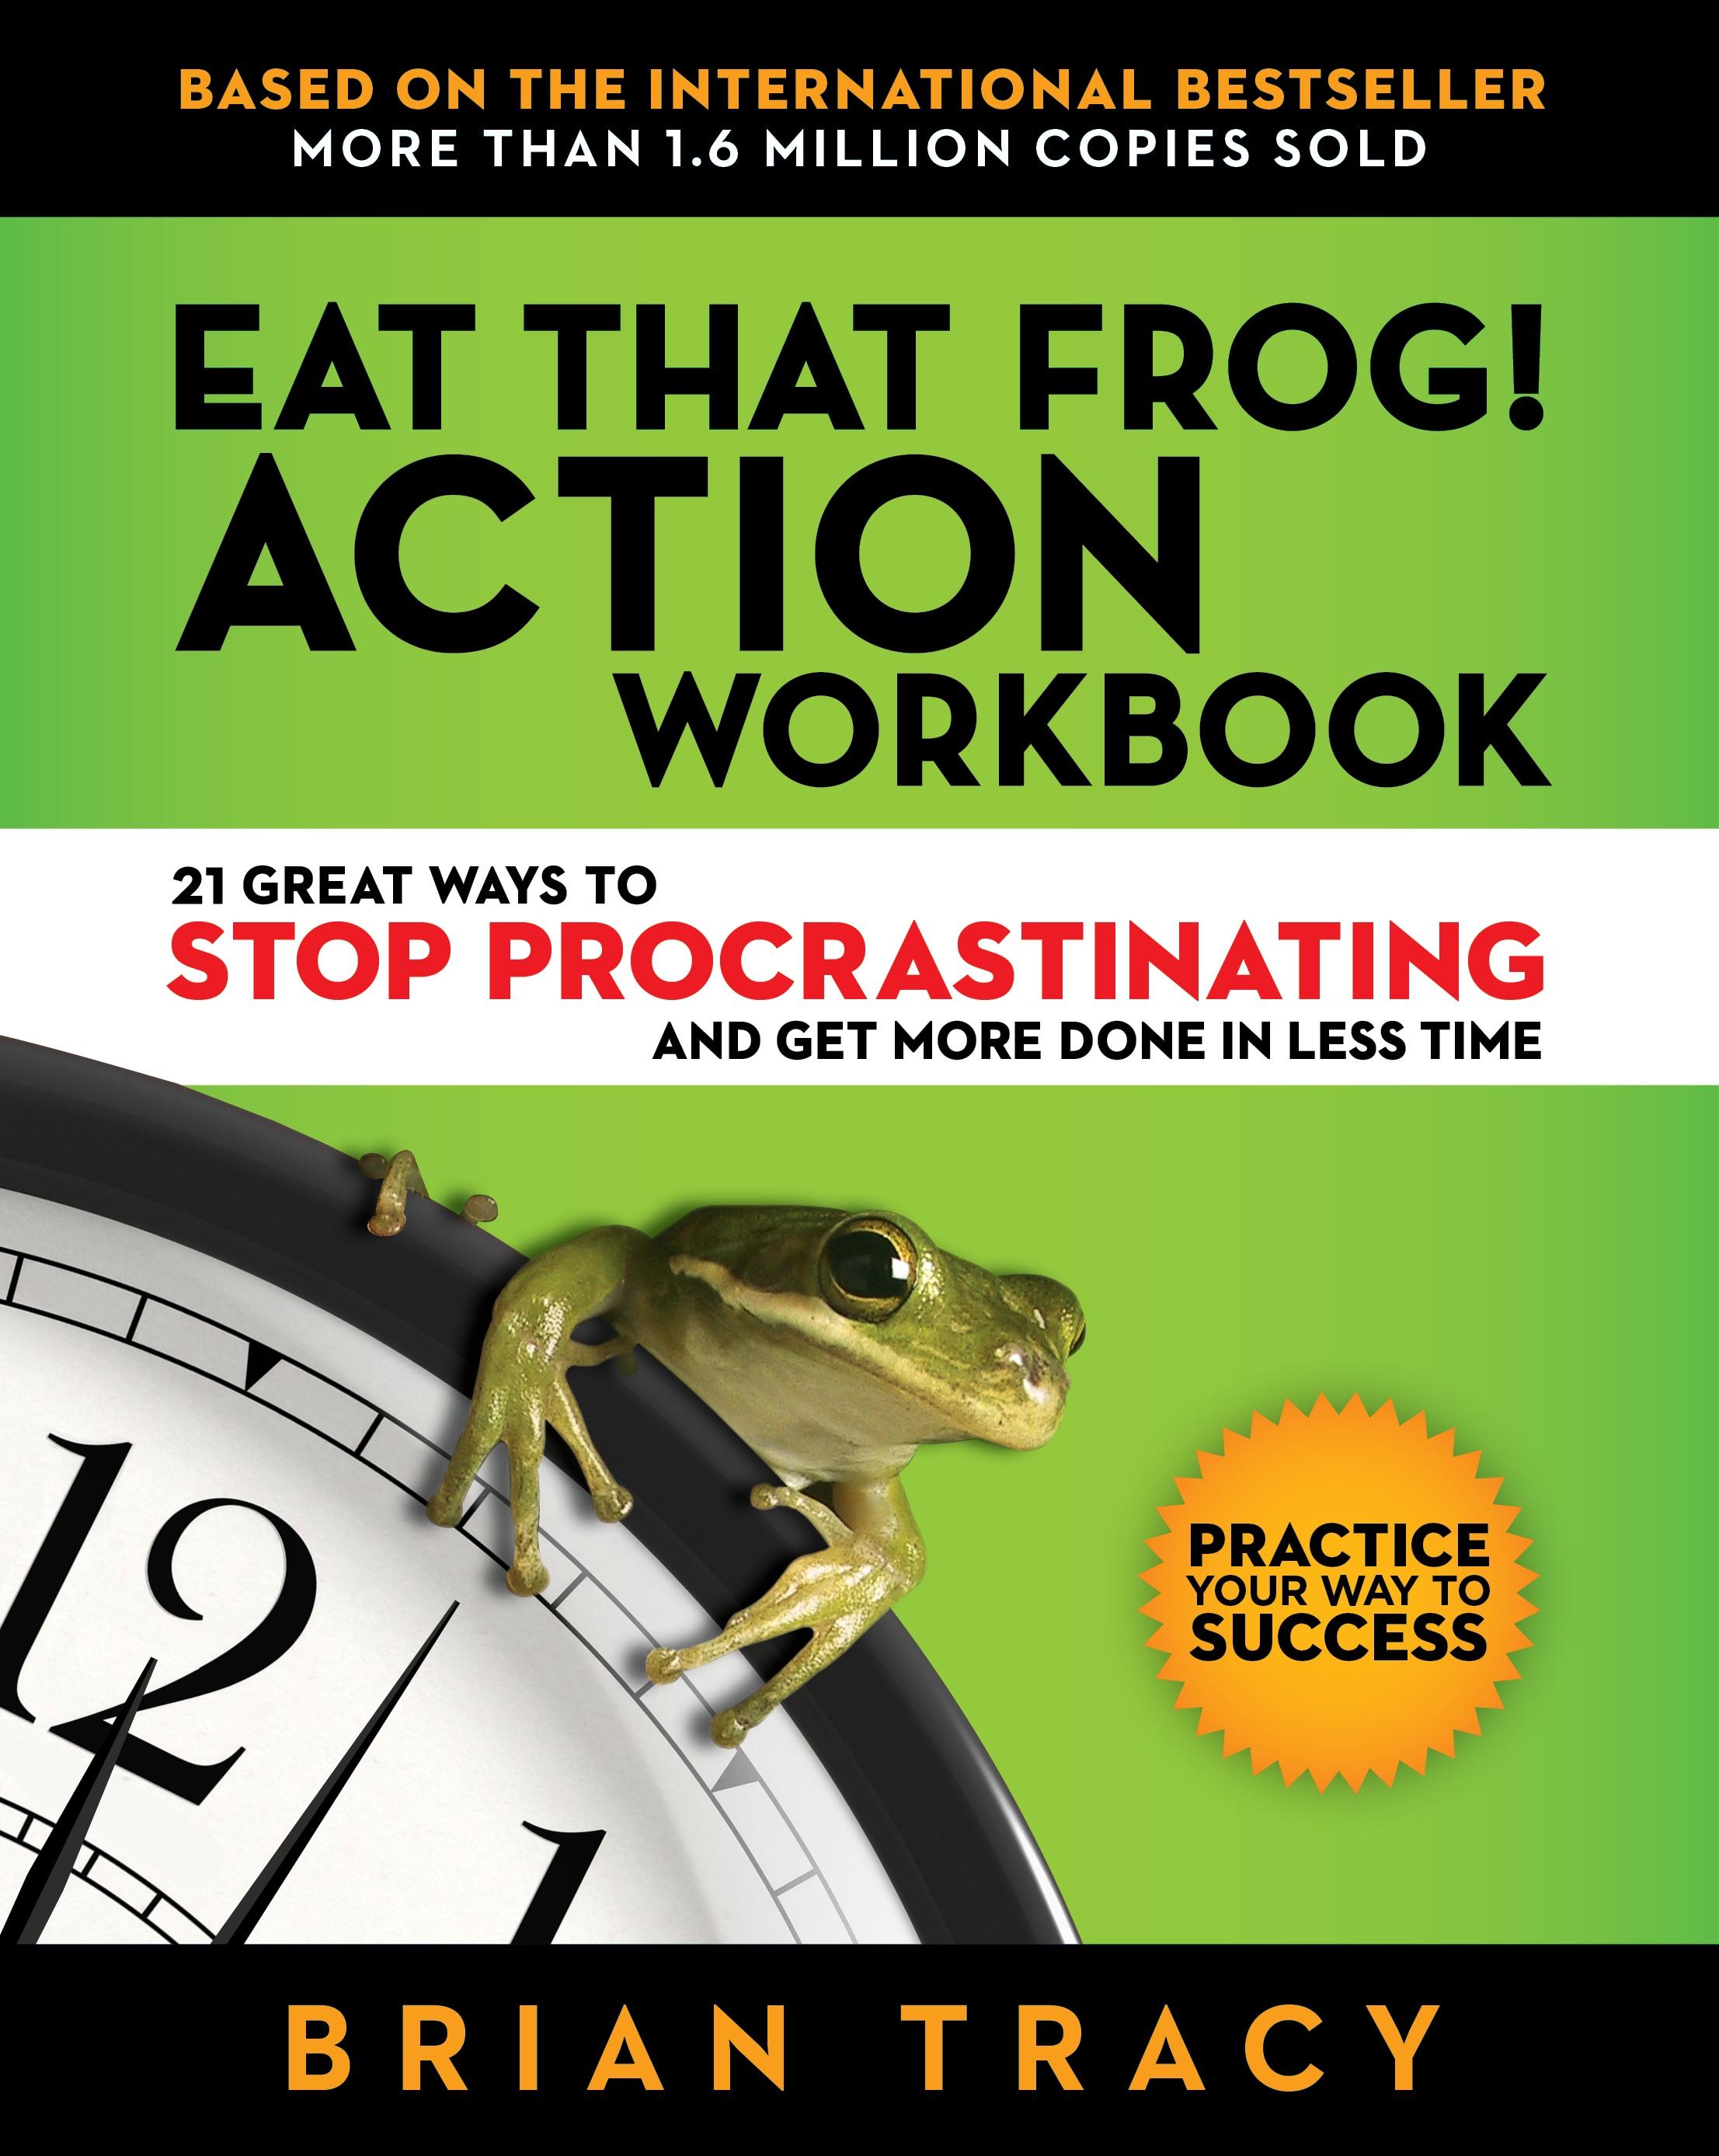 ETF Workbook Cover.jpg